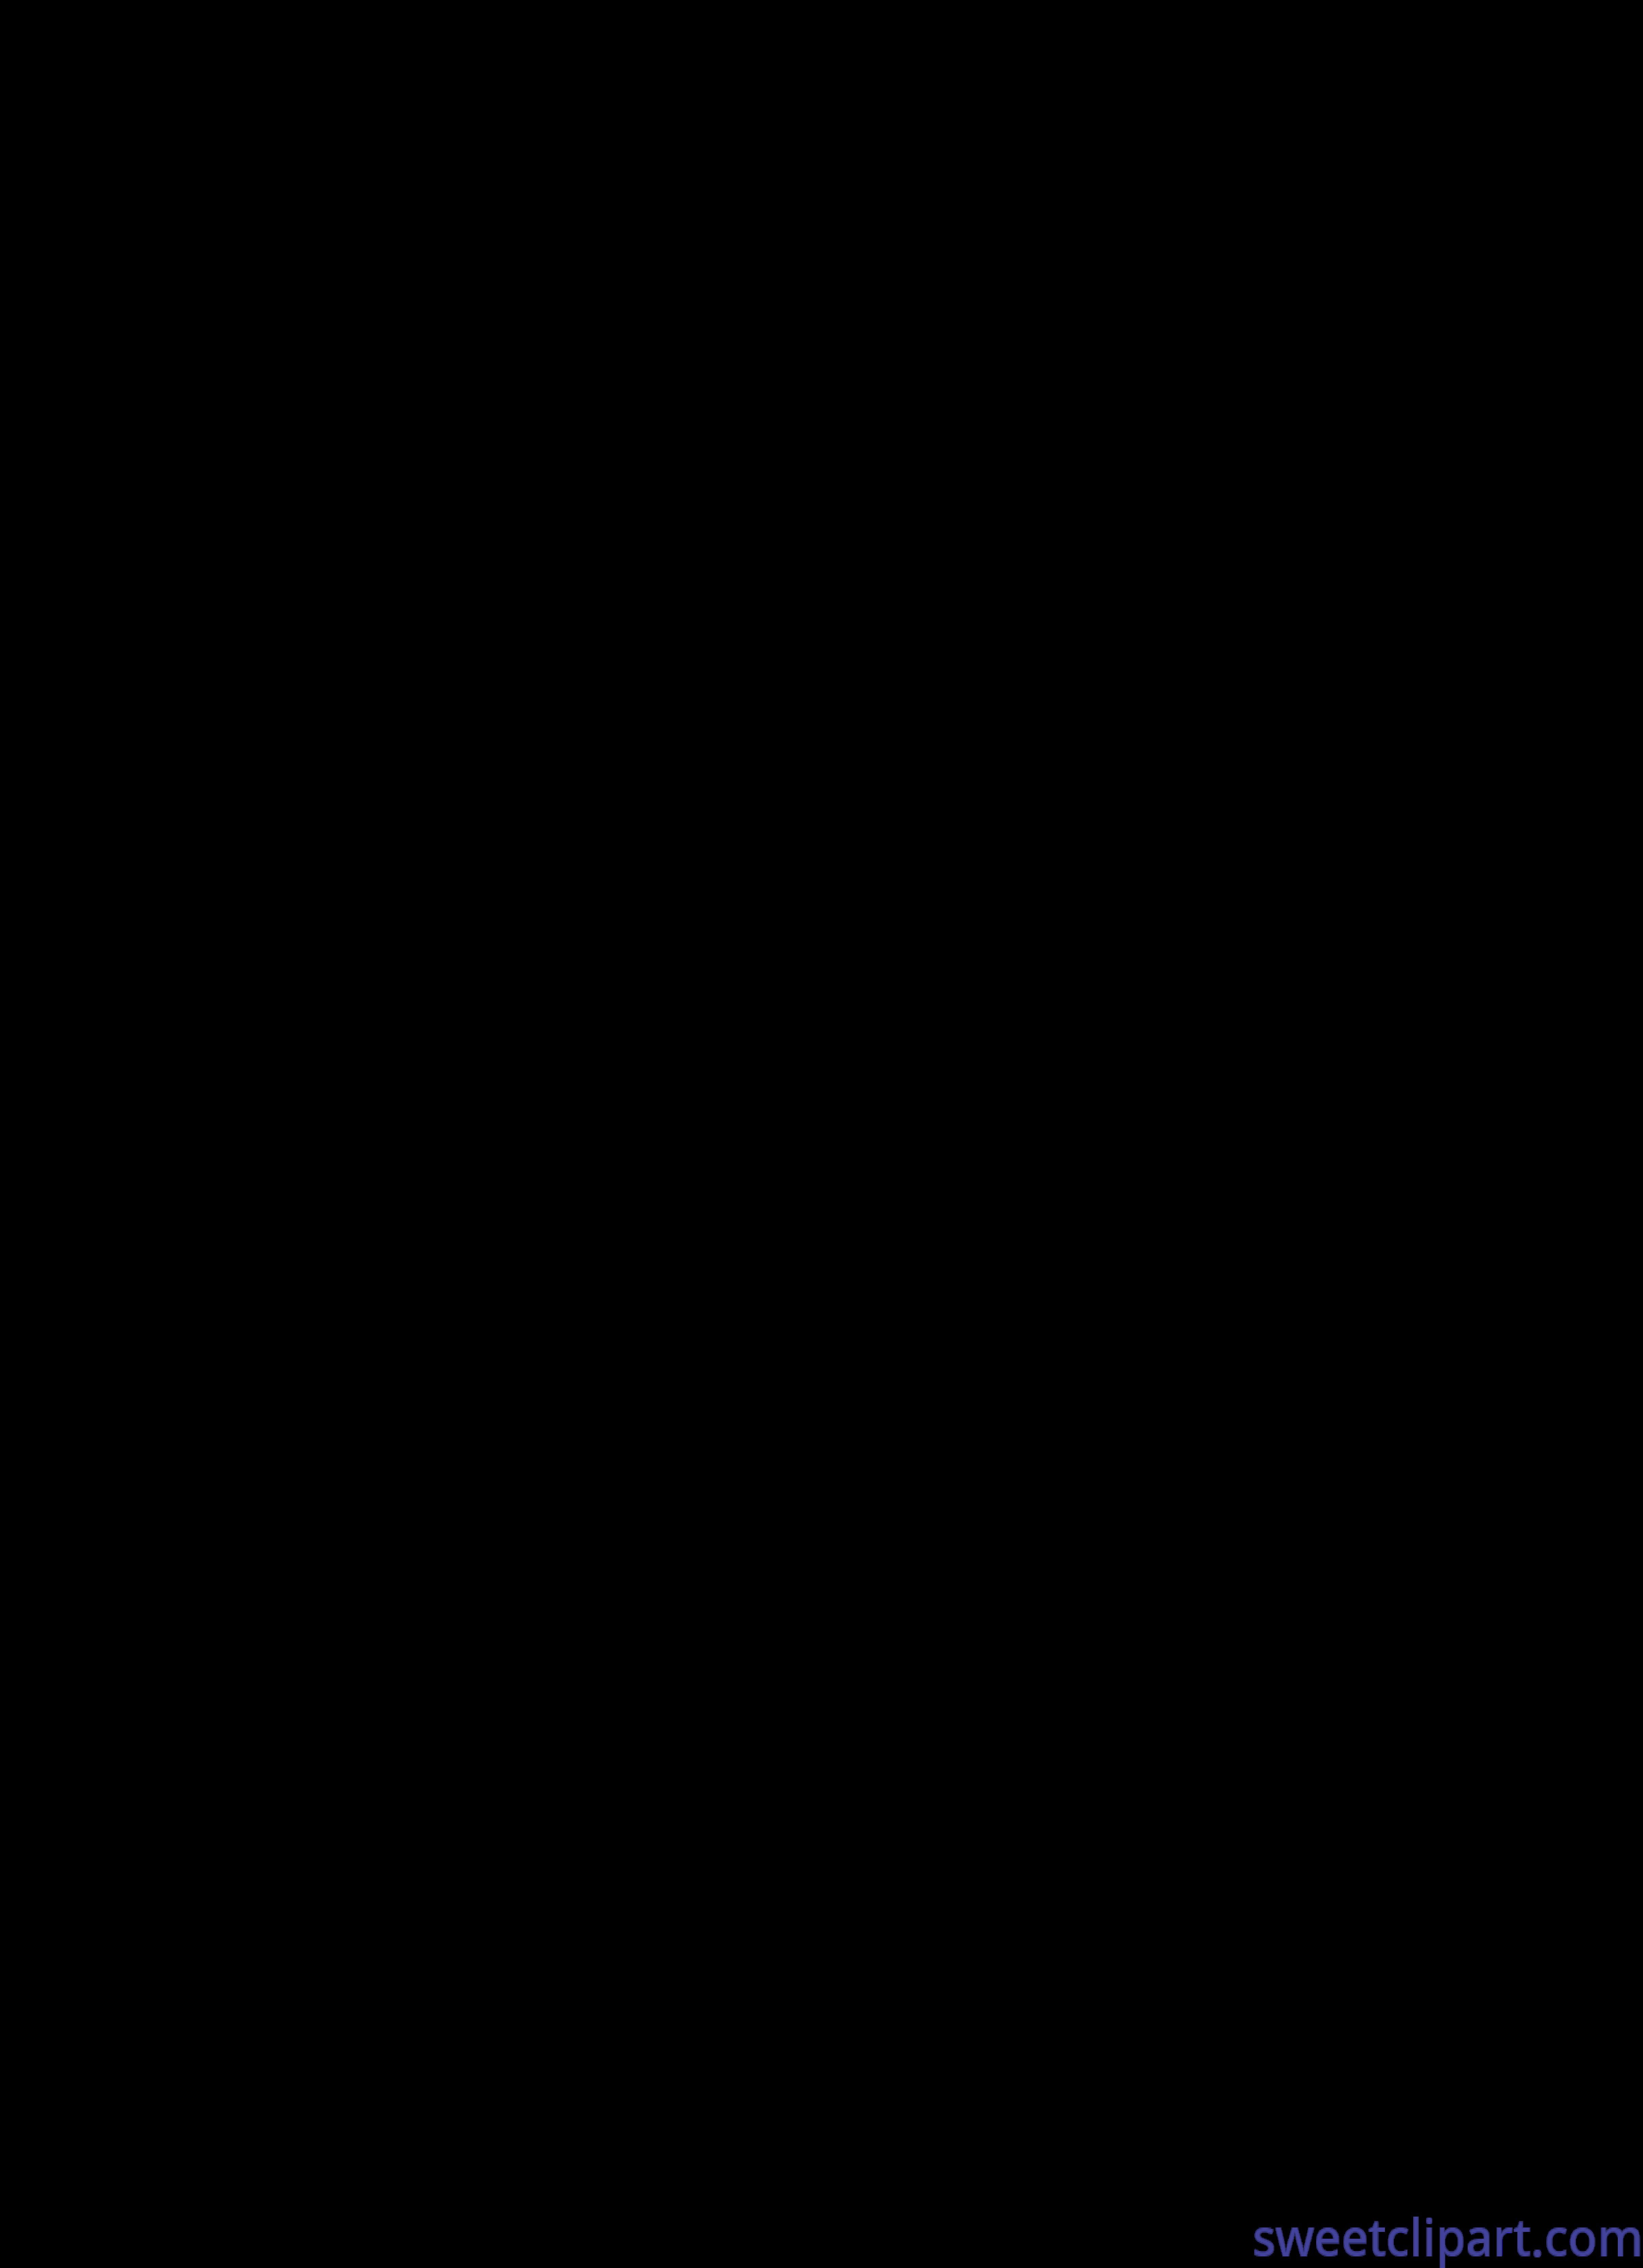 Silhouette clip art sweet. Clipart anchor